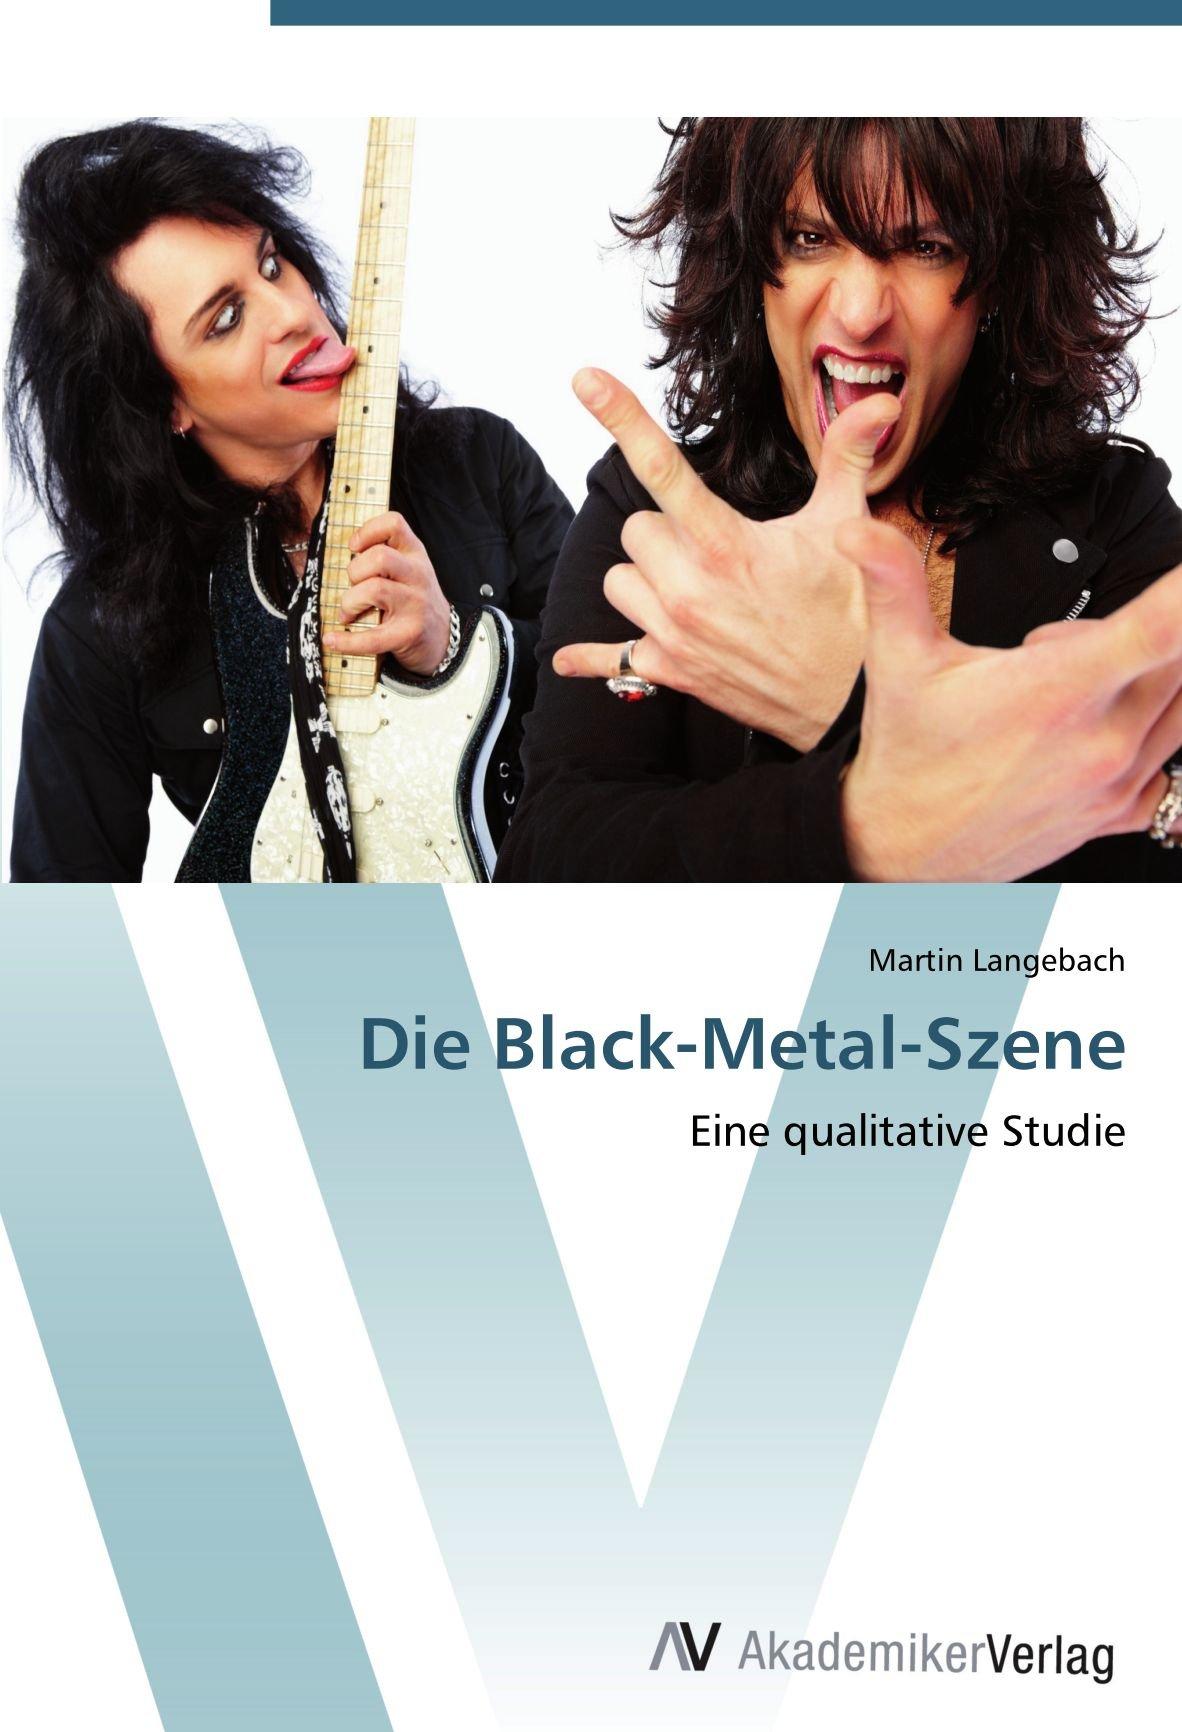 die-black-metal-szene-eine-qualitative-studie